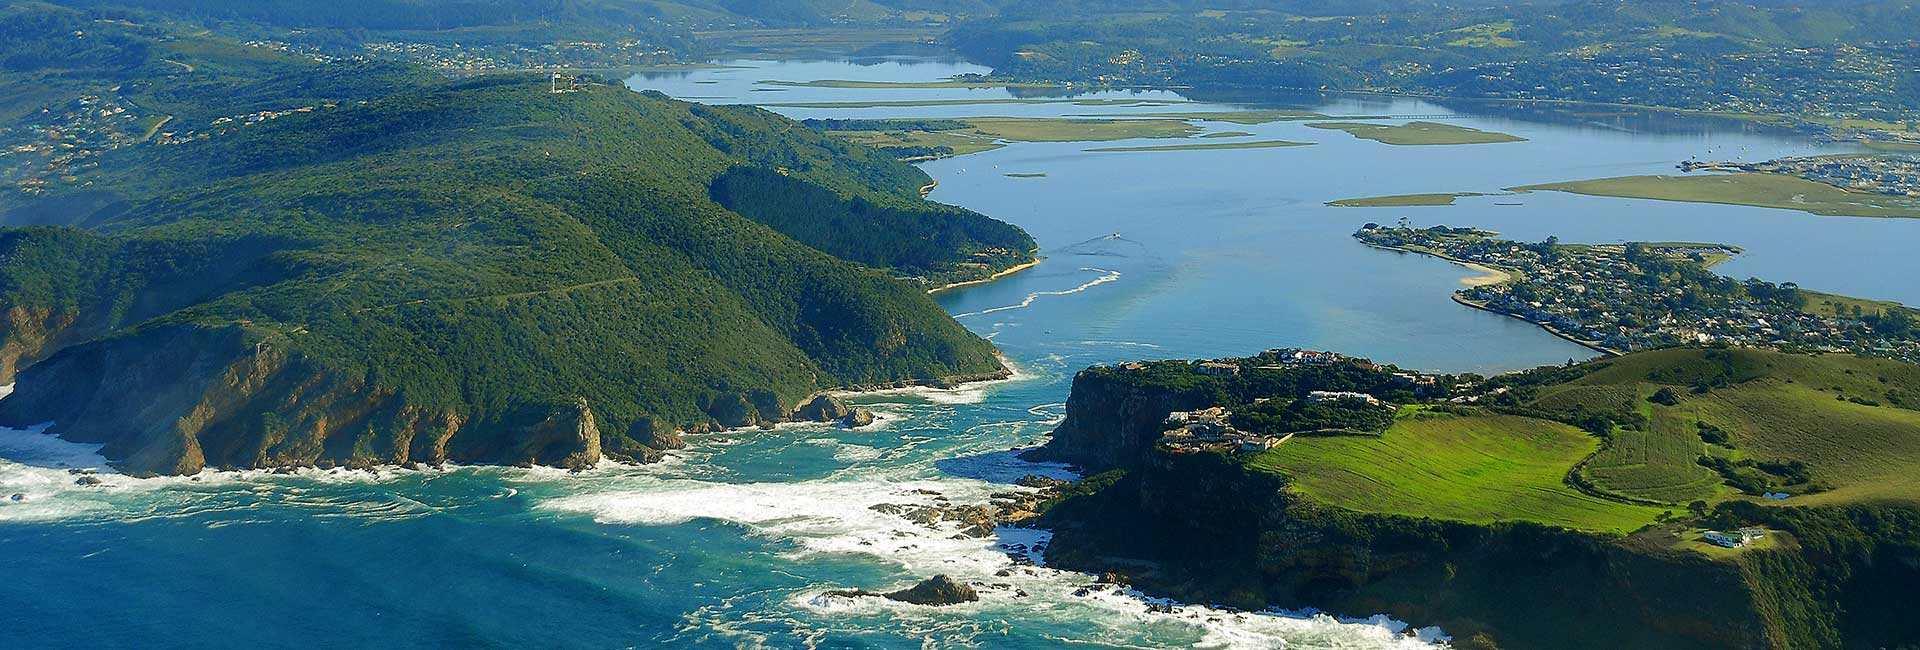 Knysna heads in South Africa